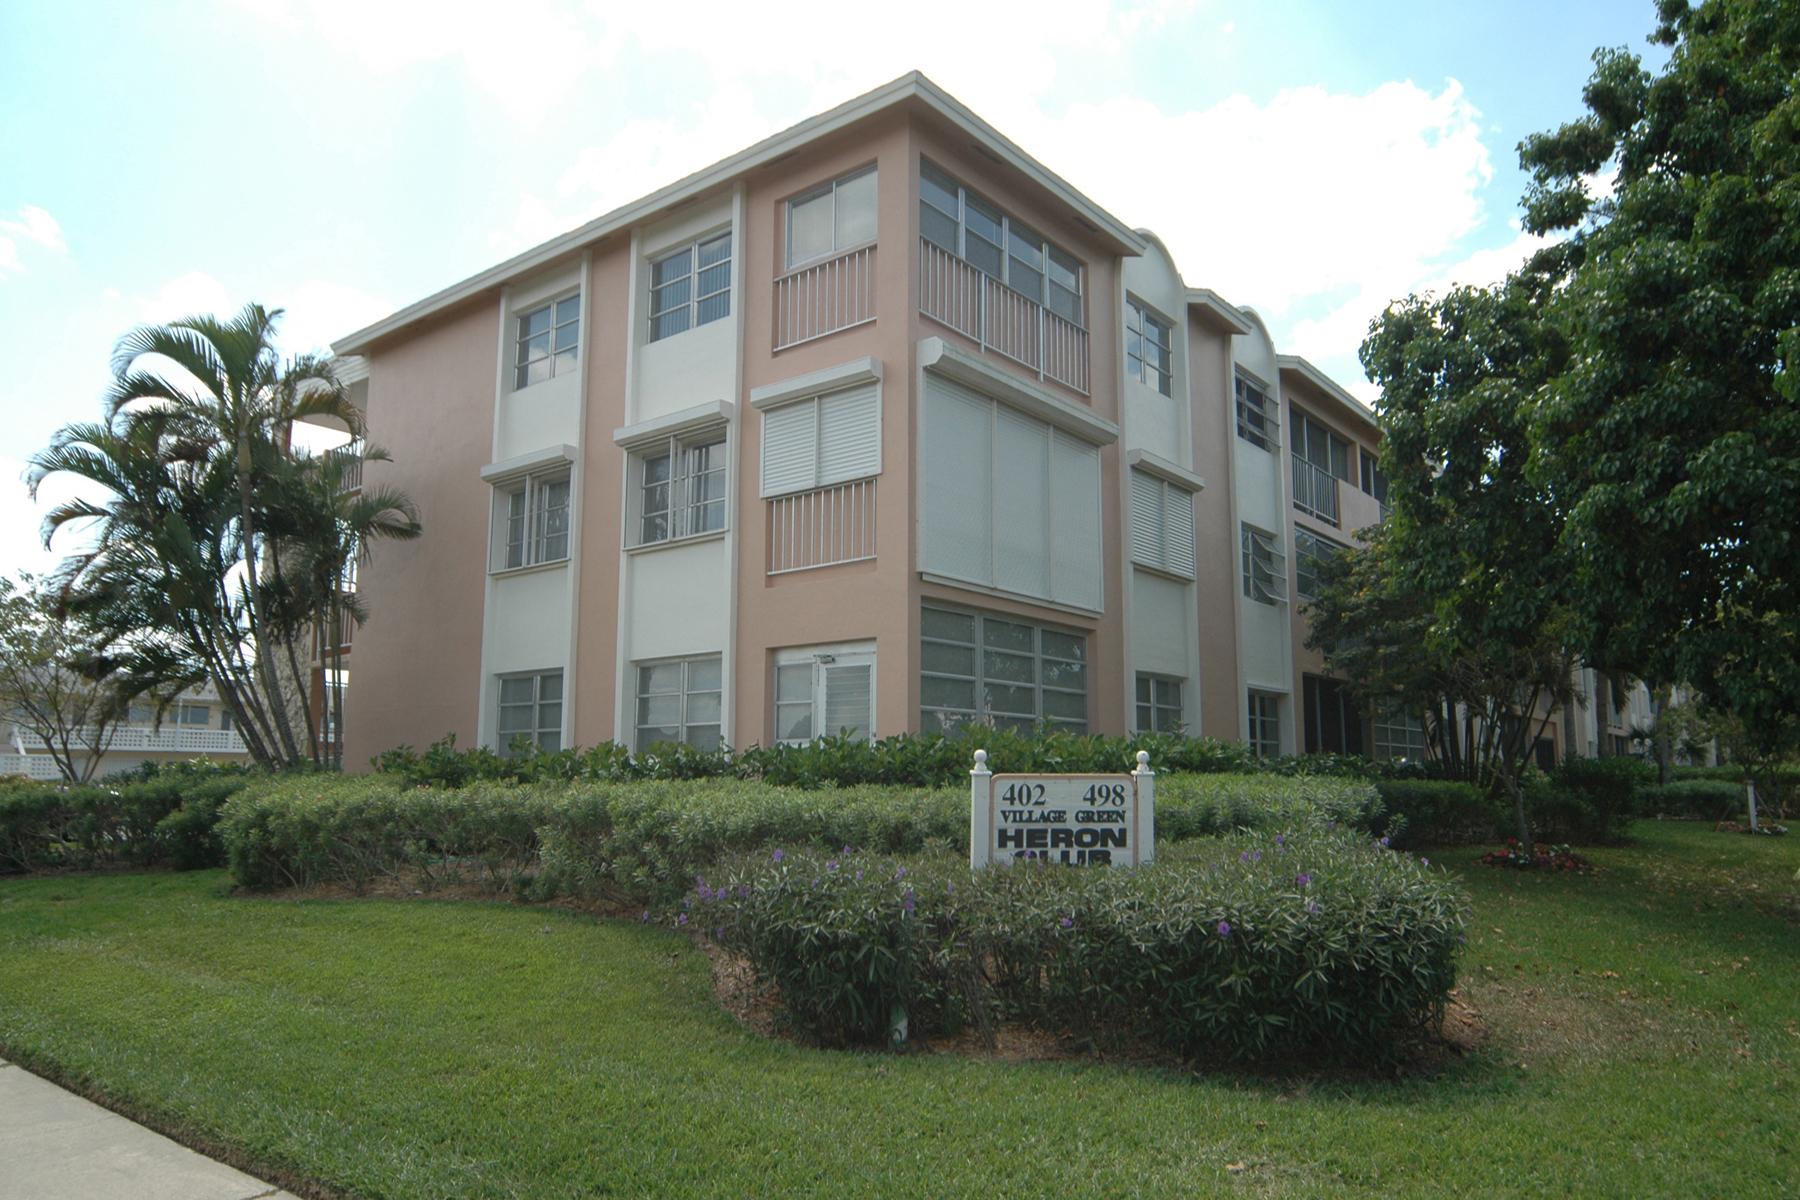 Condomínio para Venda às 418 Broad Ave S, H-418, Naples, FL 34102 418 Broad Ave S H-418 Naples, Florida 34102 Estados Unidos